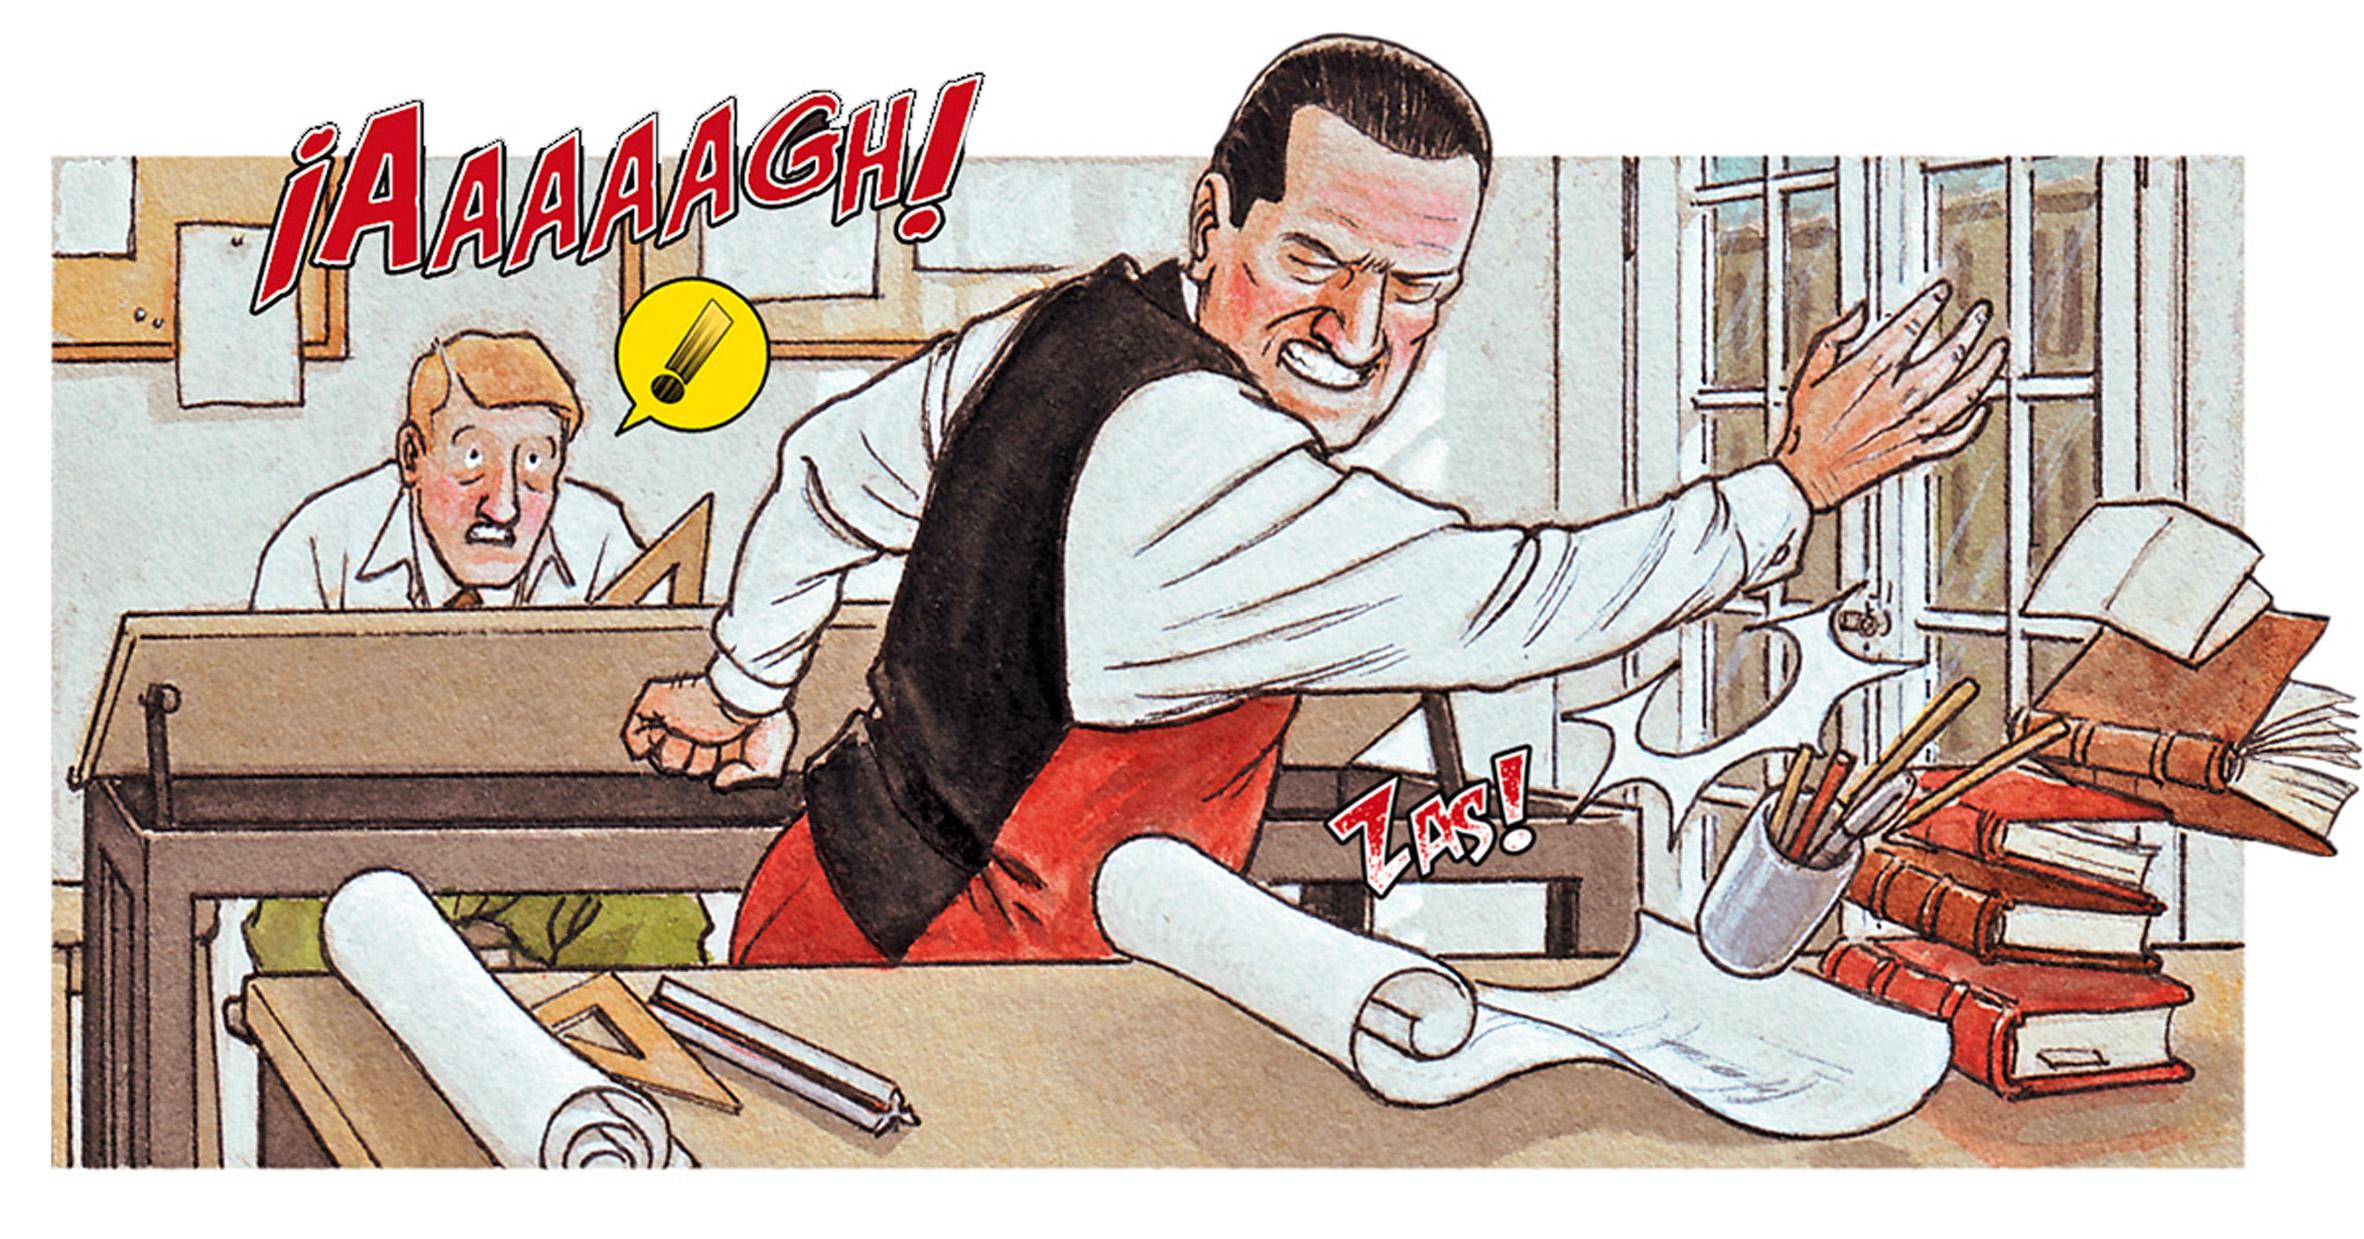 Mies comic by Agustin Ferrer Casas